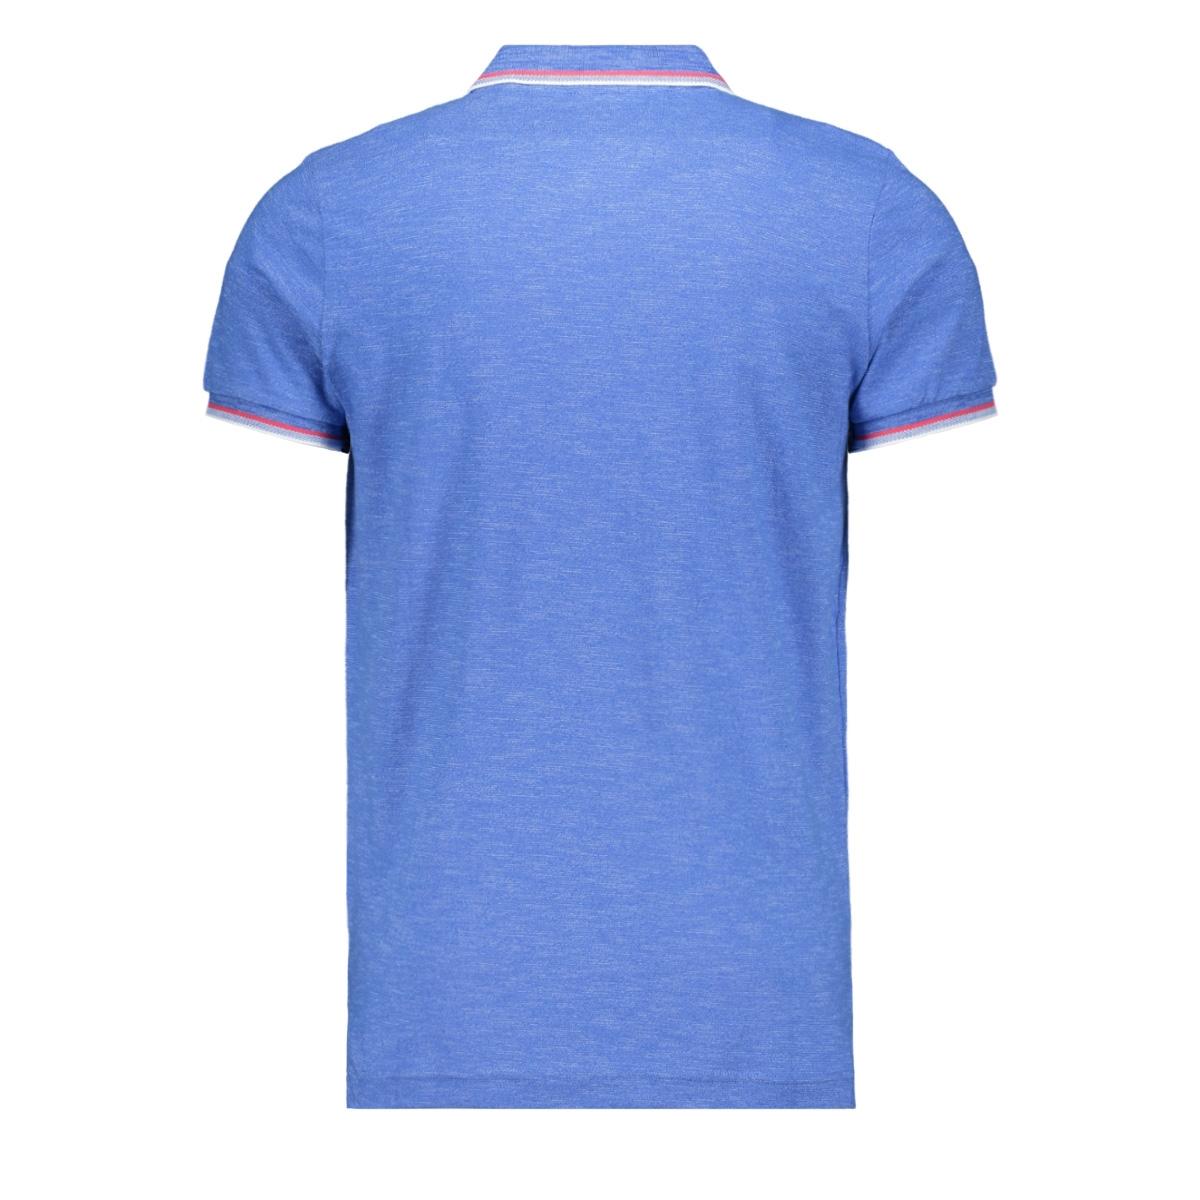 hanlon 20an110 nza polo 260 new blue